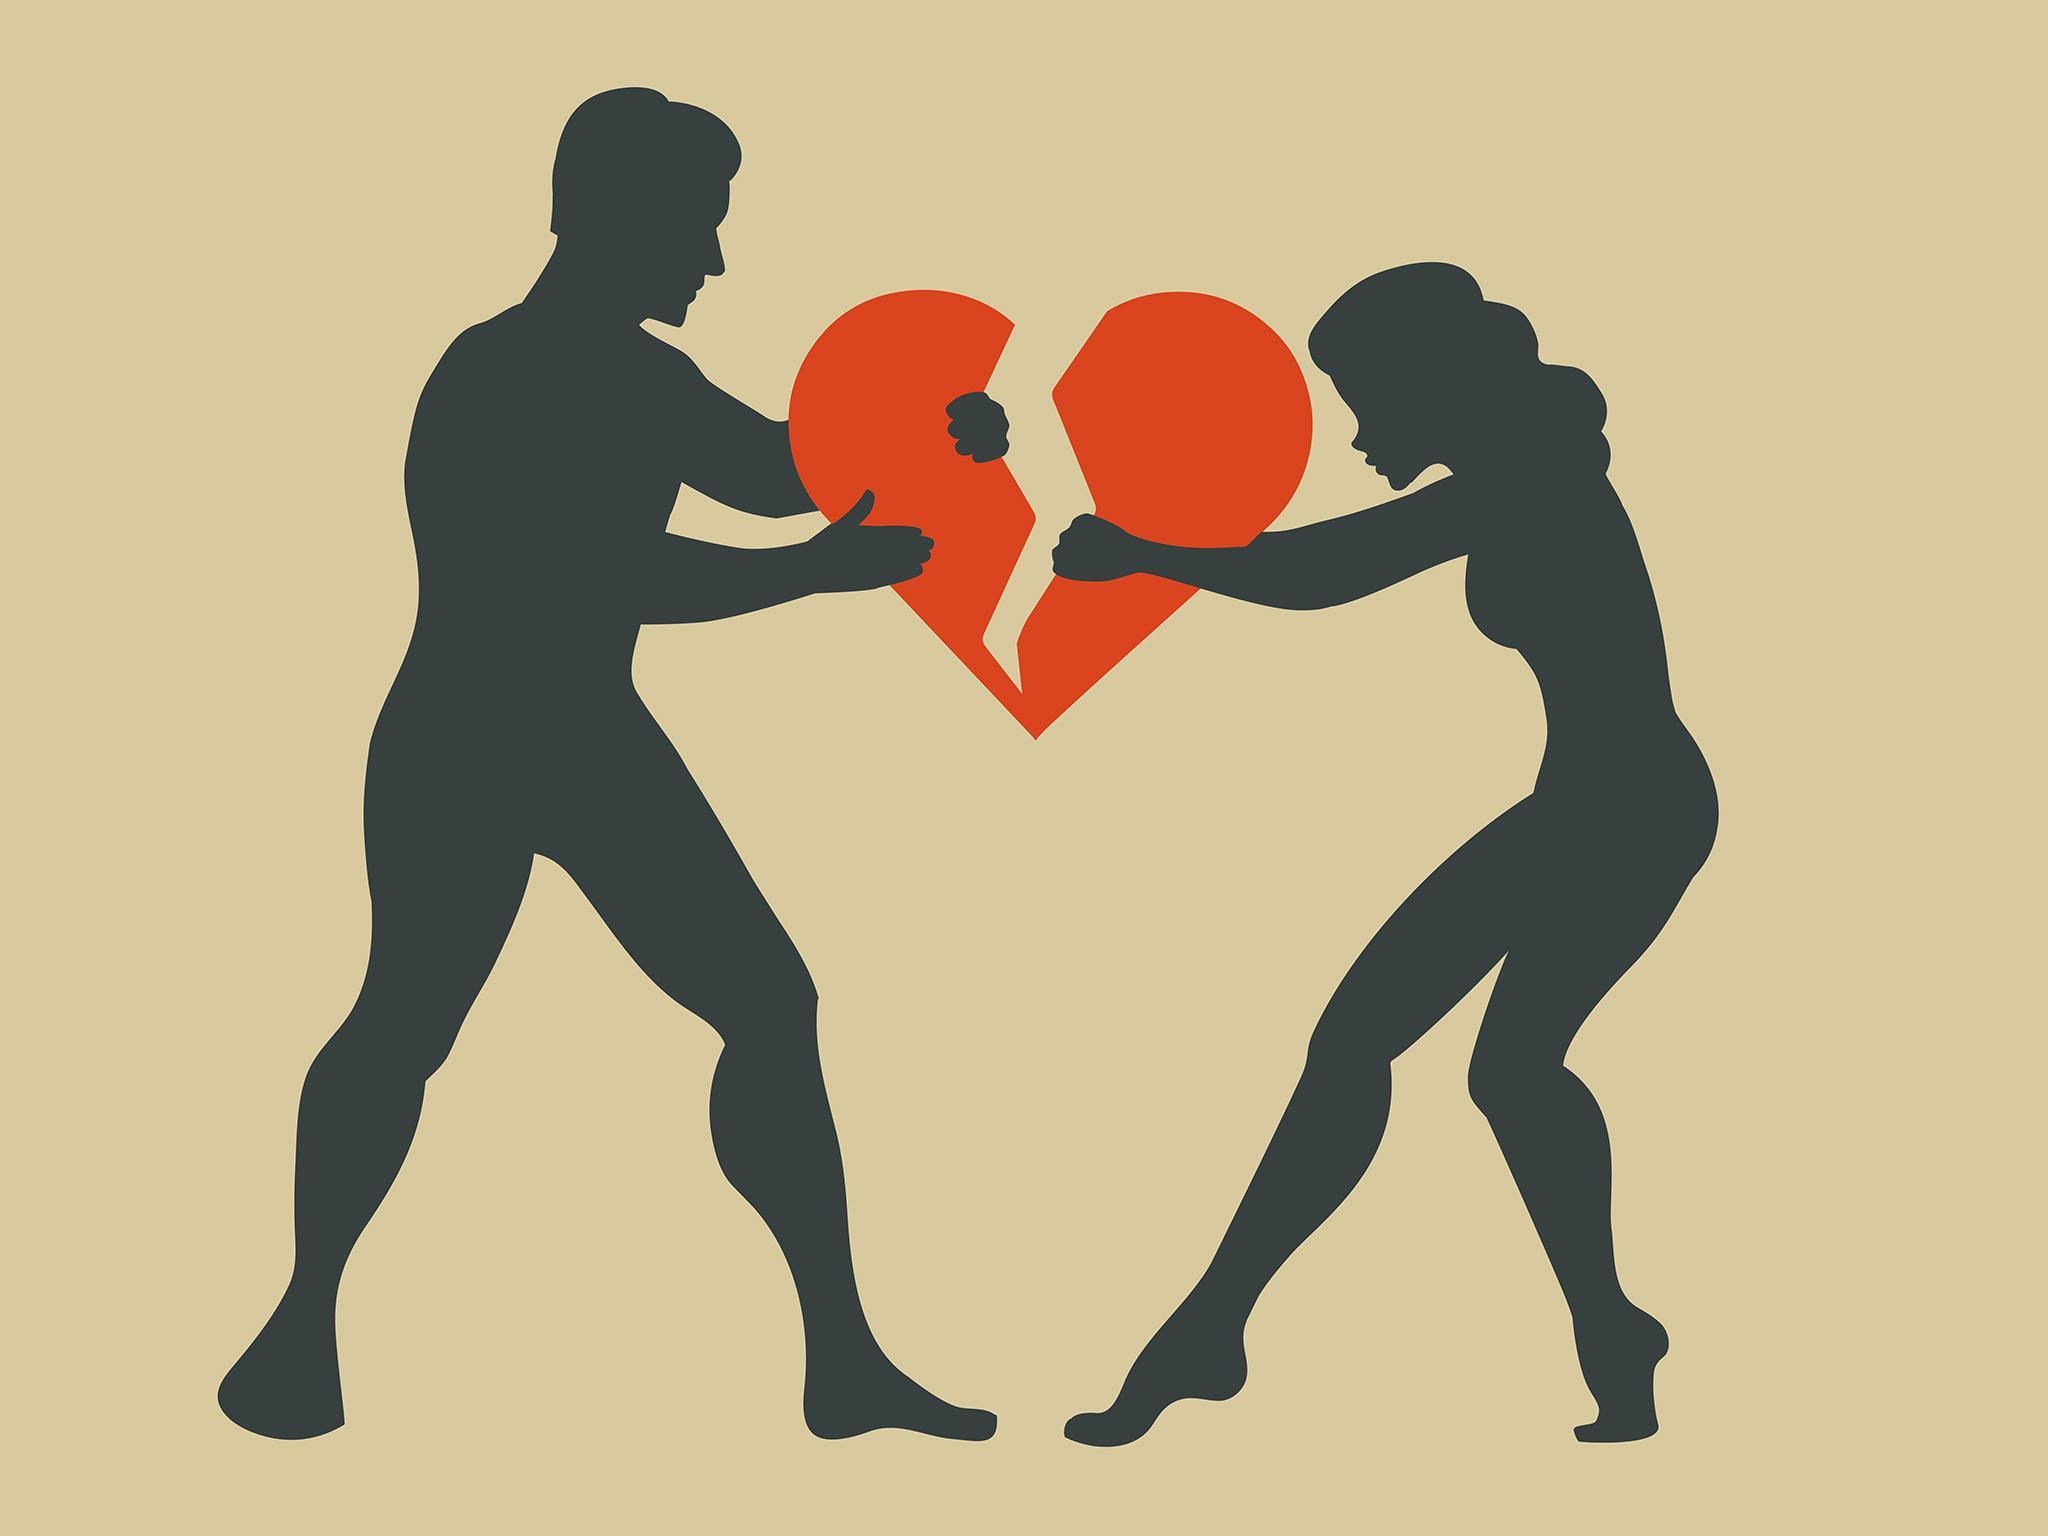 divorț/boli cardiace: femei versus bărbați